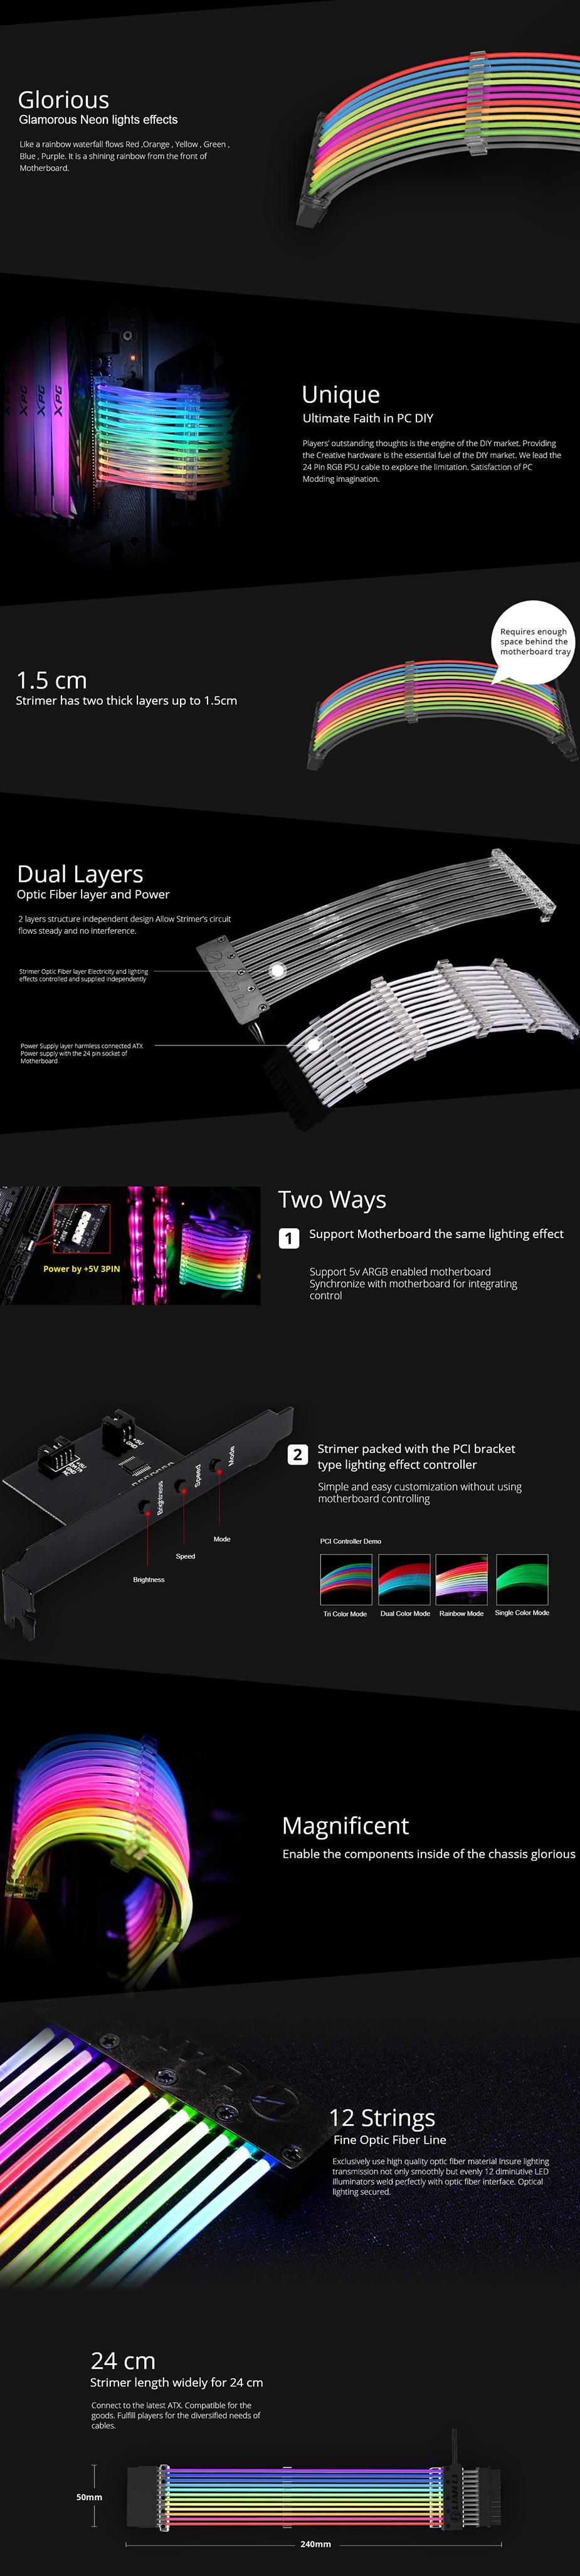 Lian-Li Strimer 24 Pin RGB PSU Extension Cable - Desktop Overview 2